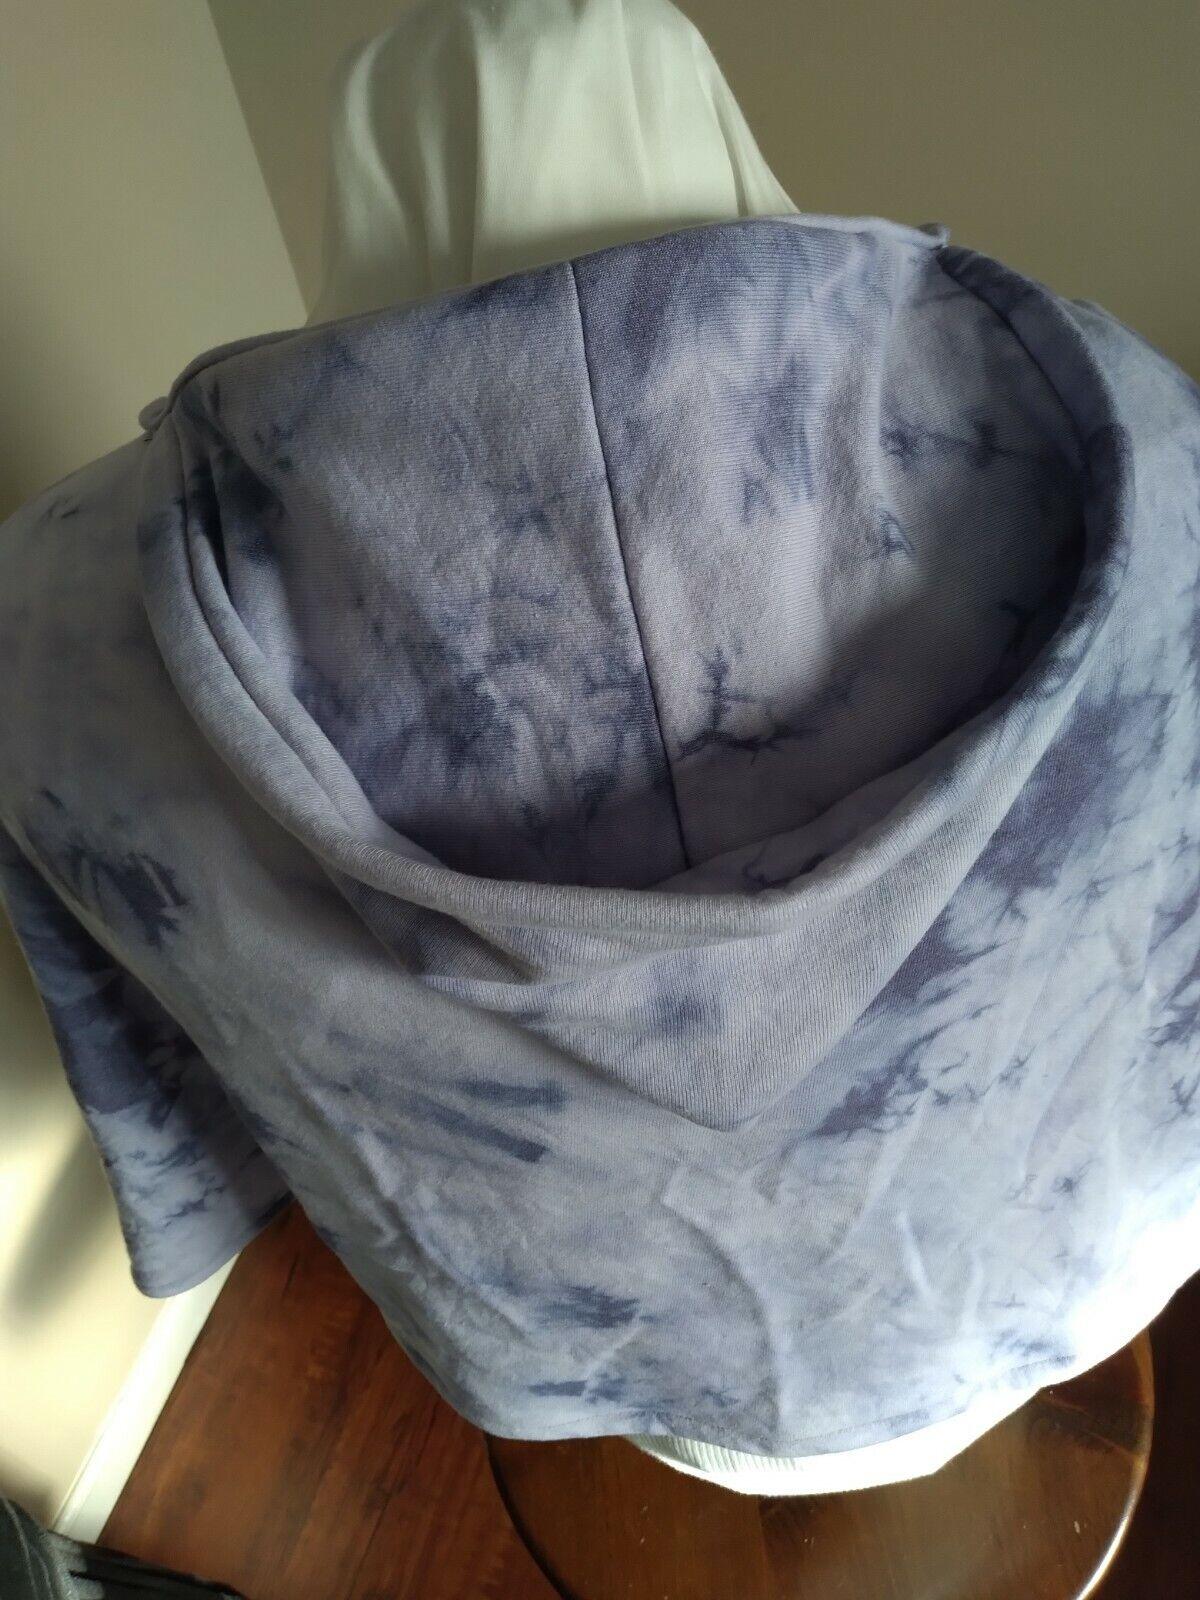 Big Kids Hooded Bath Beach Set Wing loops +Washcloths Cotton Terrycloth Handmade